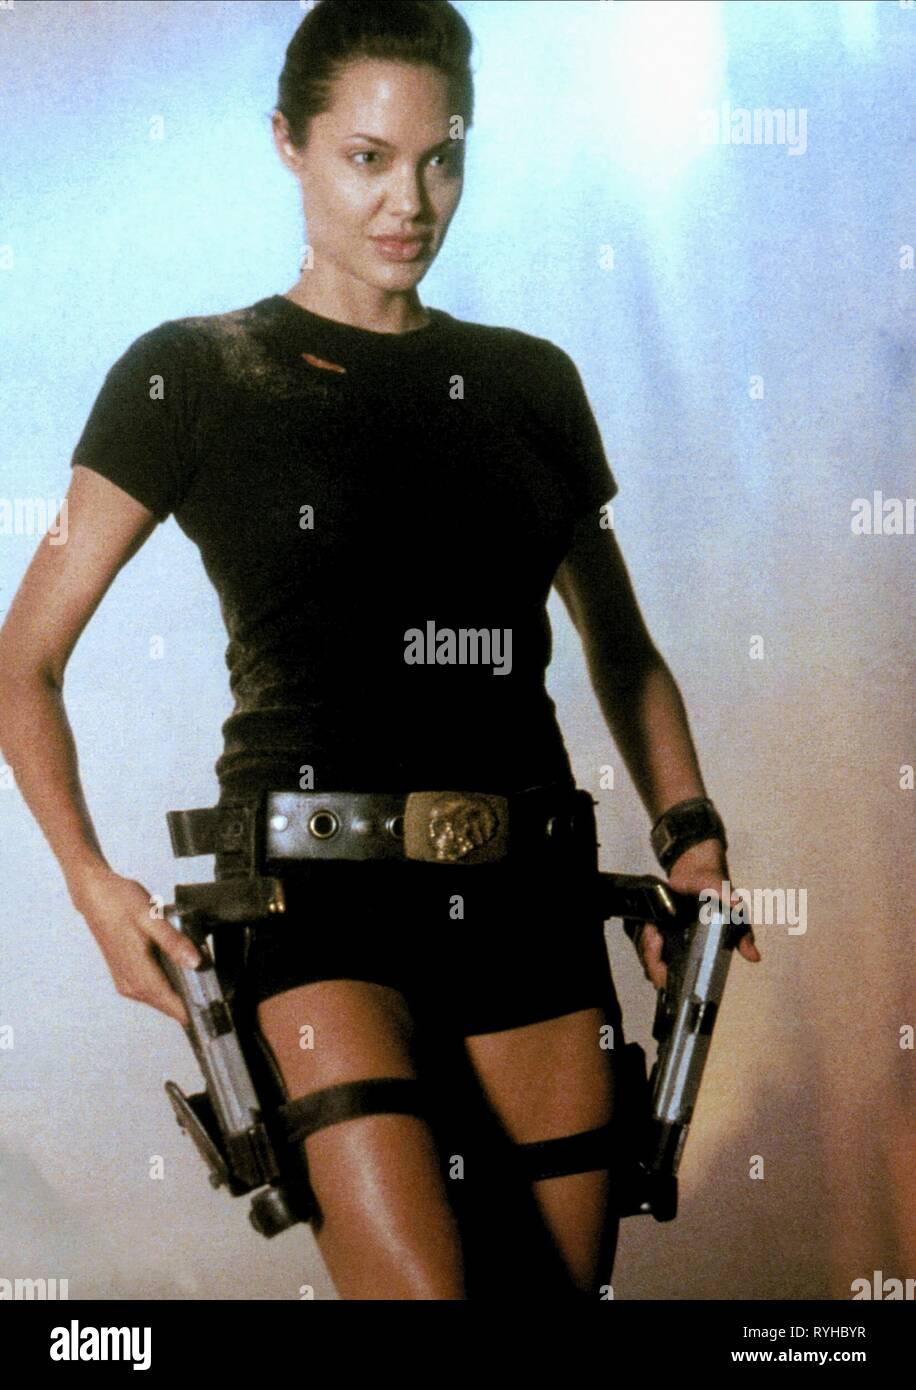 Angelina Jolie Lara Croft Tomb Raider 2001 Stock Photo Alamy